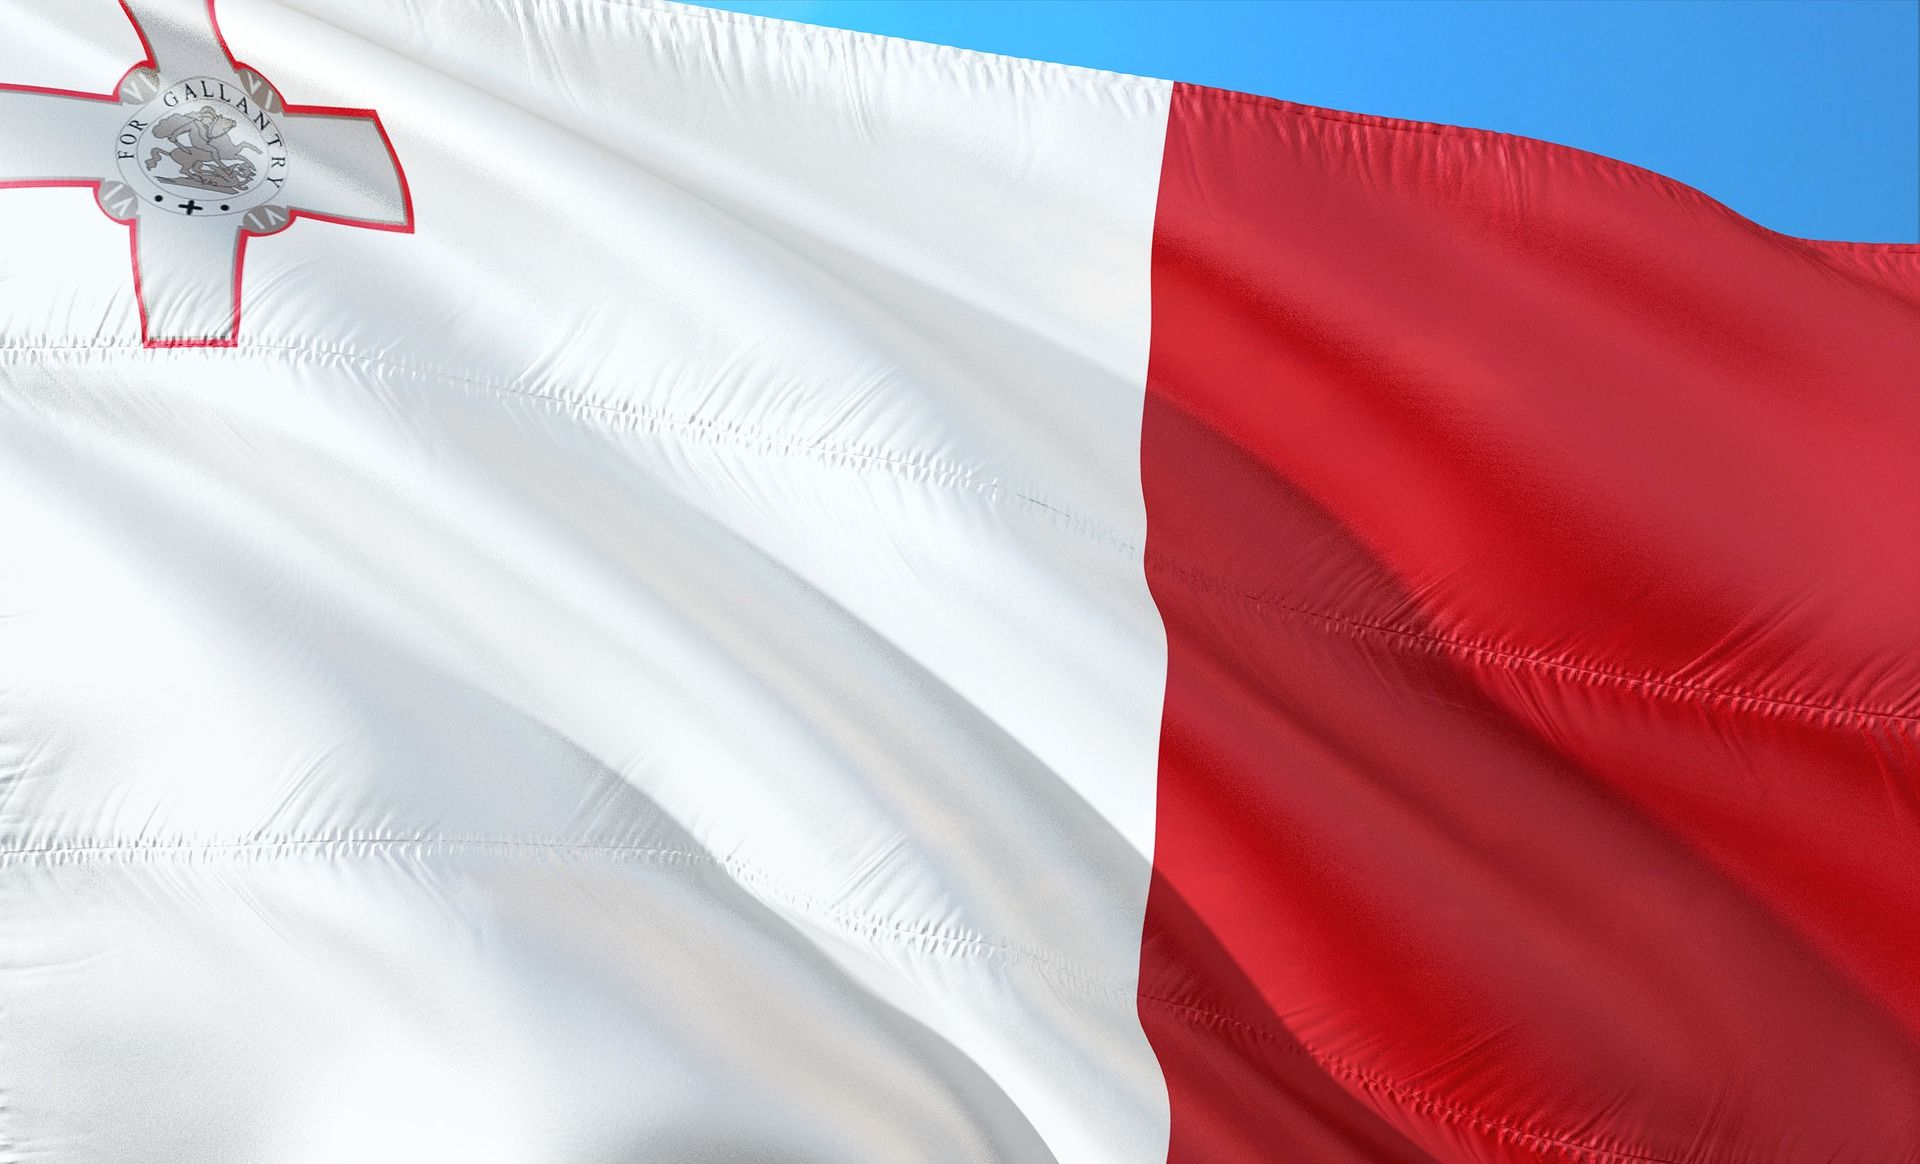 Malta spustila dob za izlazak na izbore na 16 godina